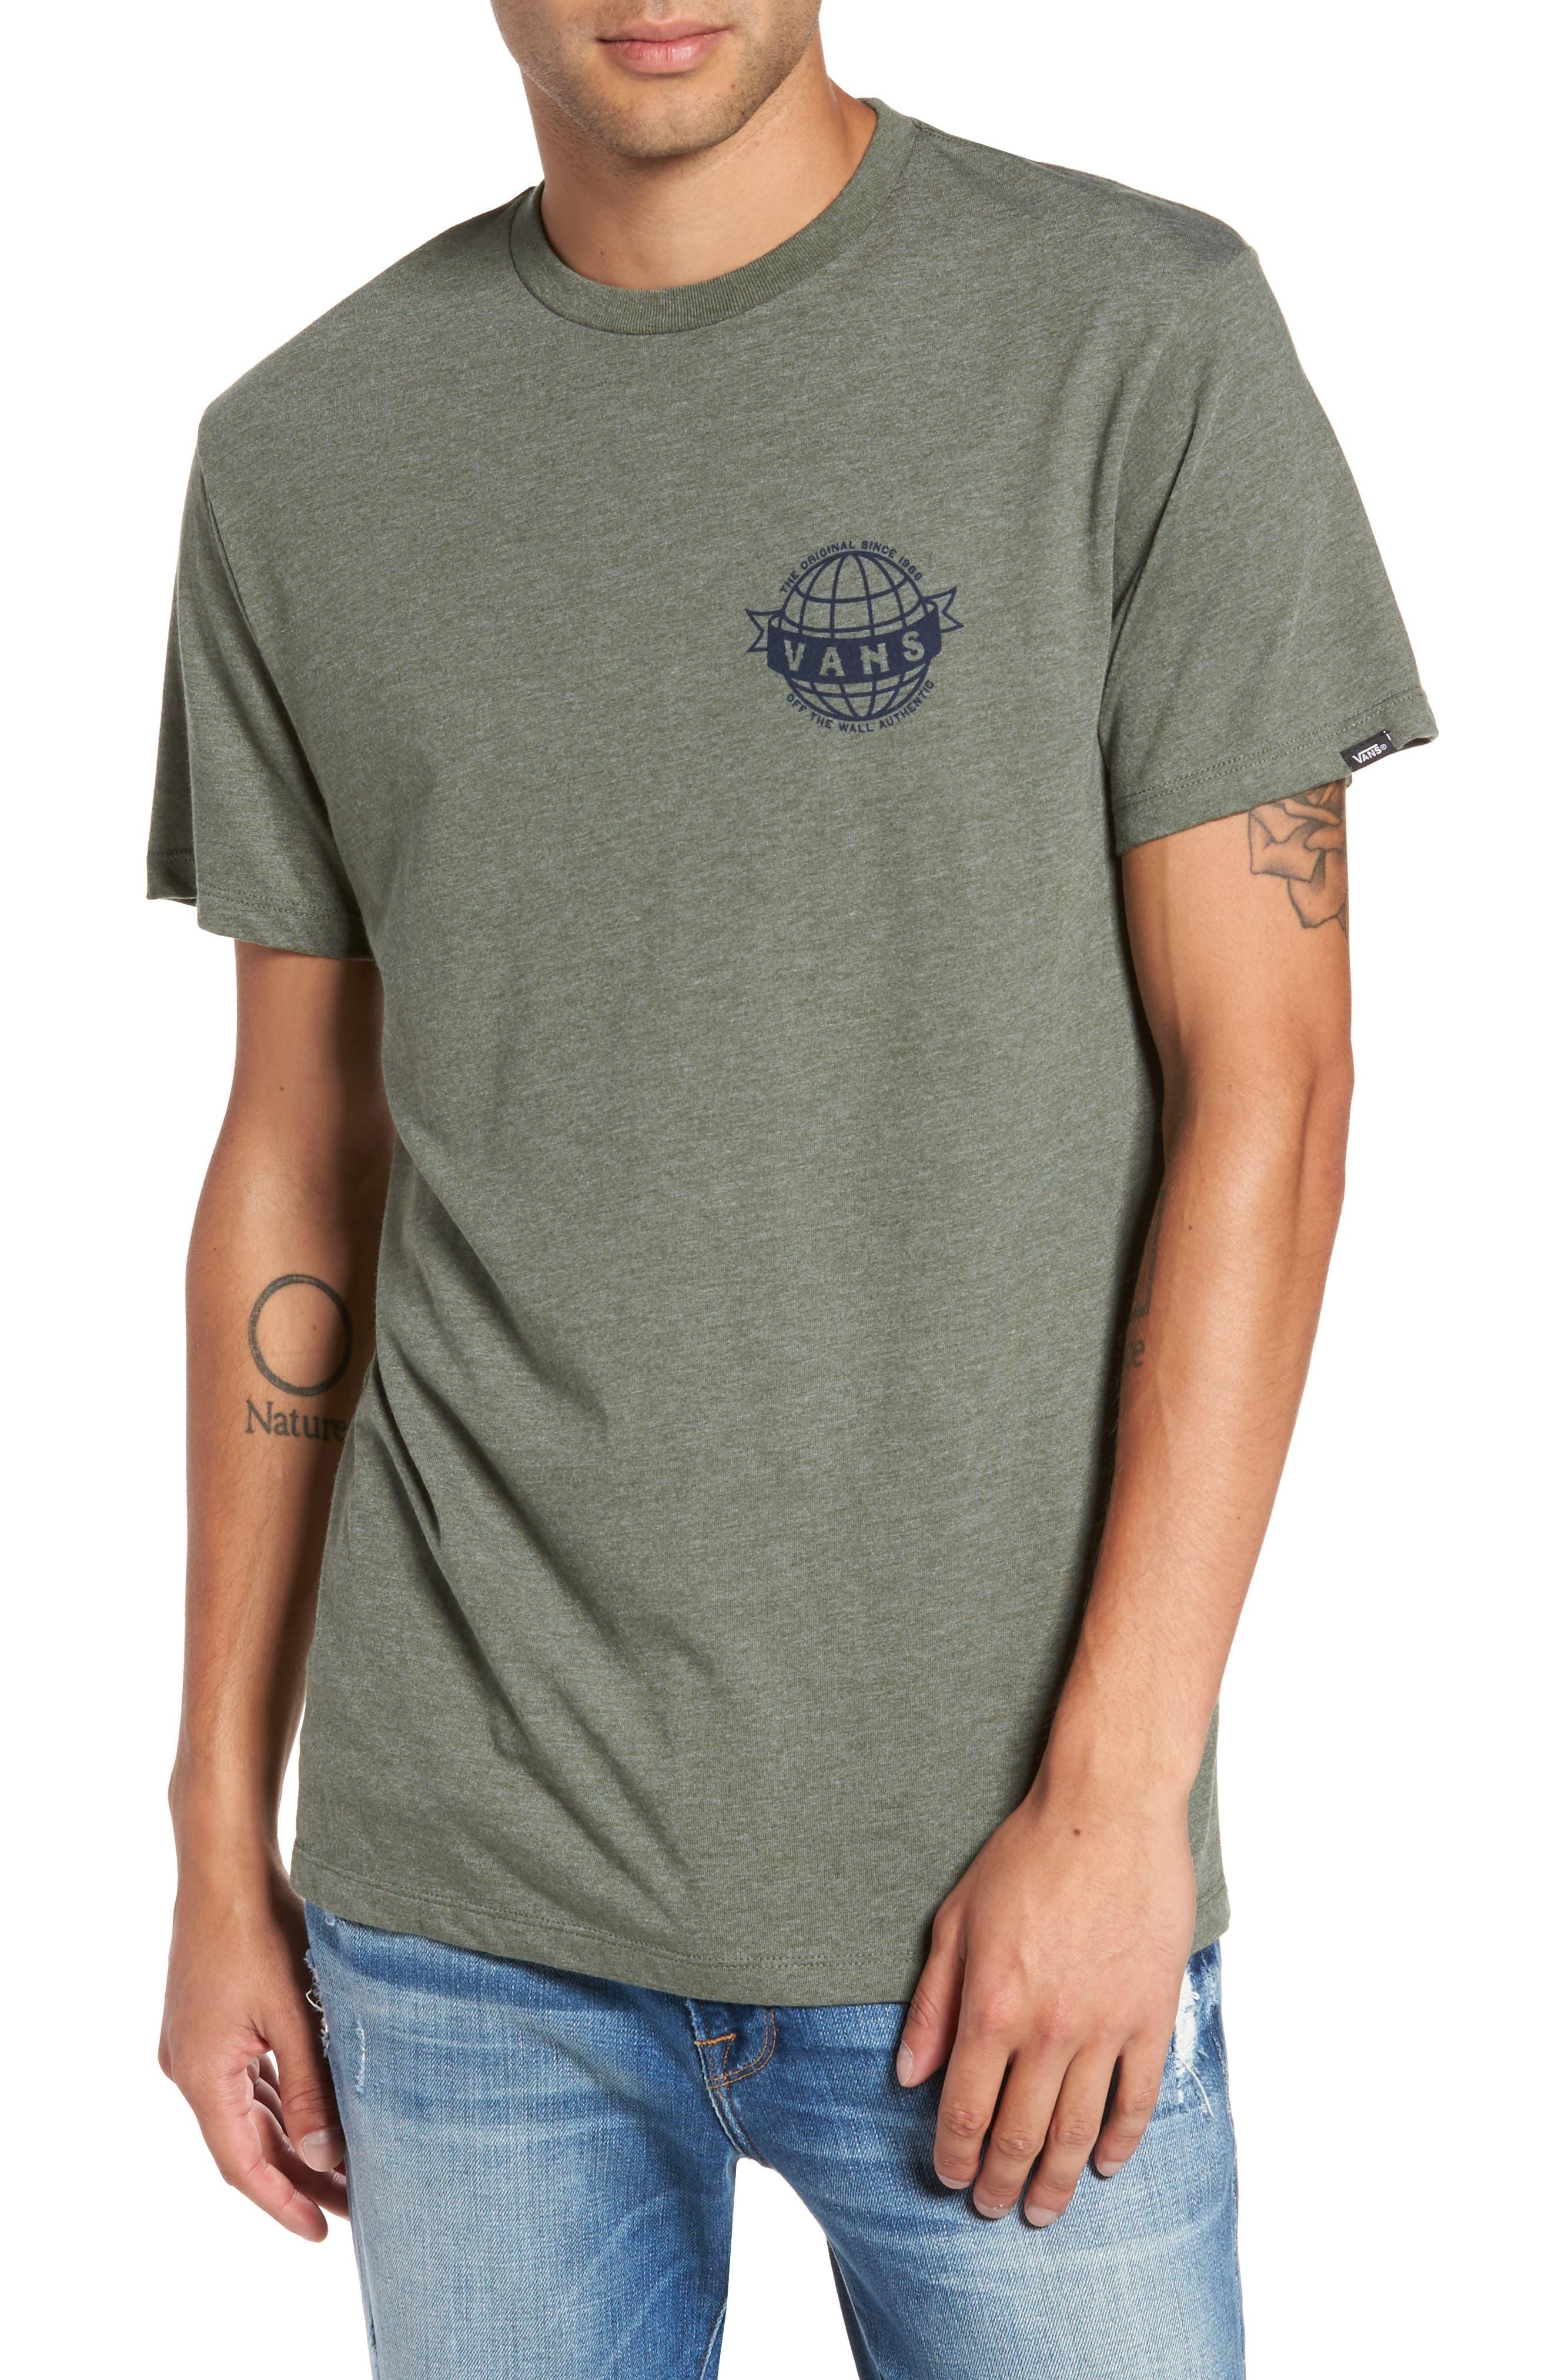 Vans Global Landing Logo Graphic T-Shirt